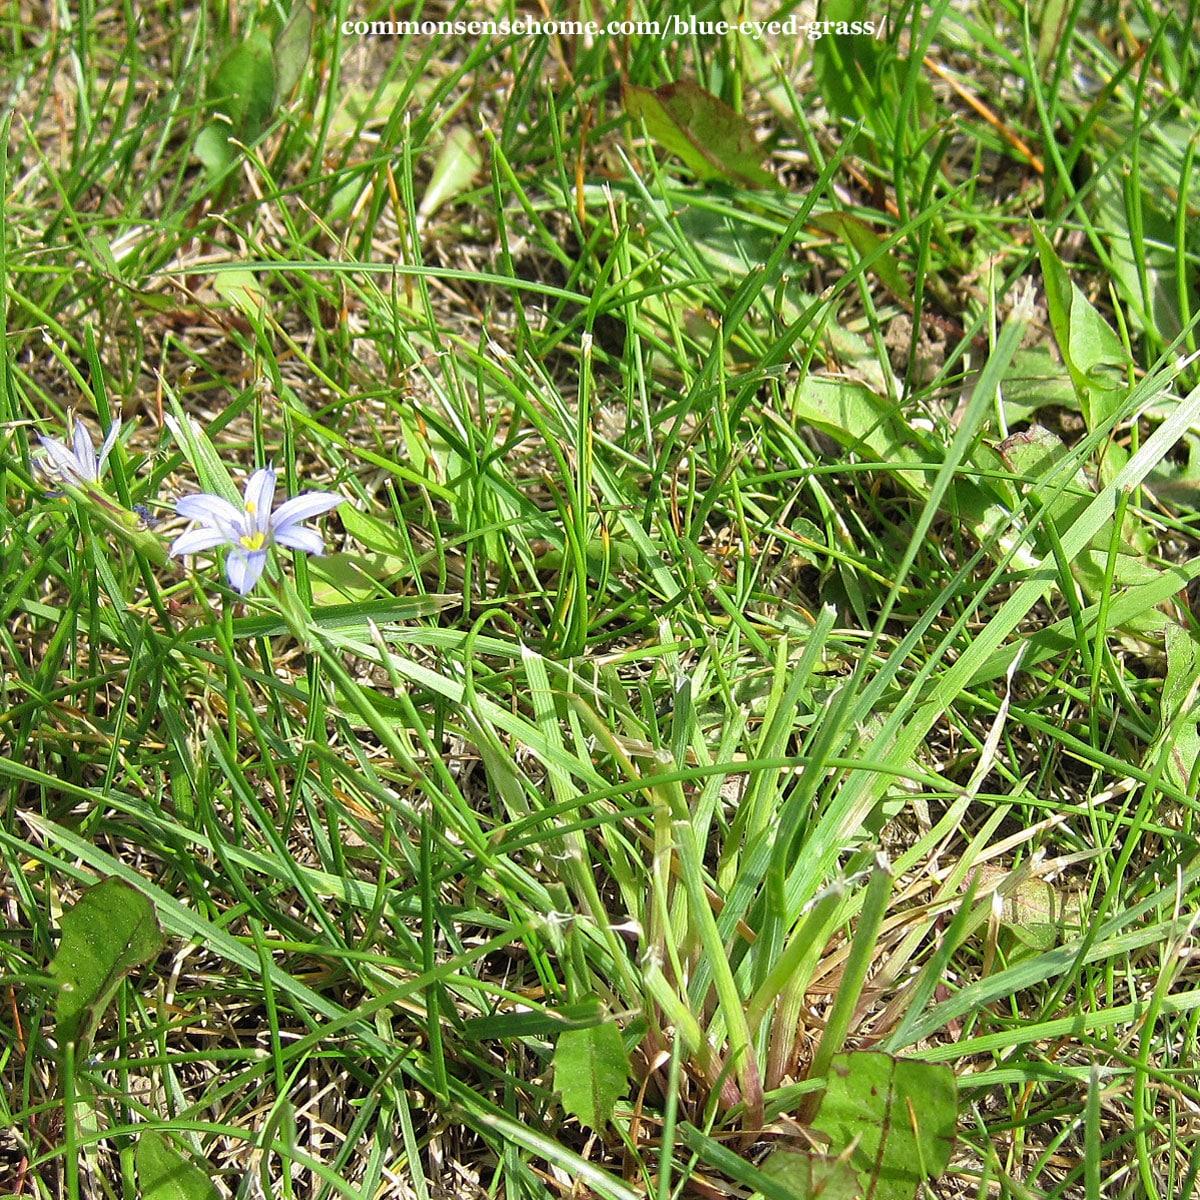 Sisyrinchium montanum plant after mowing